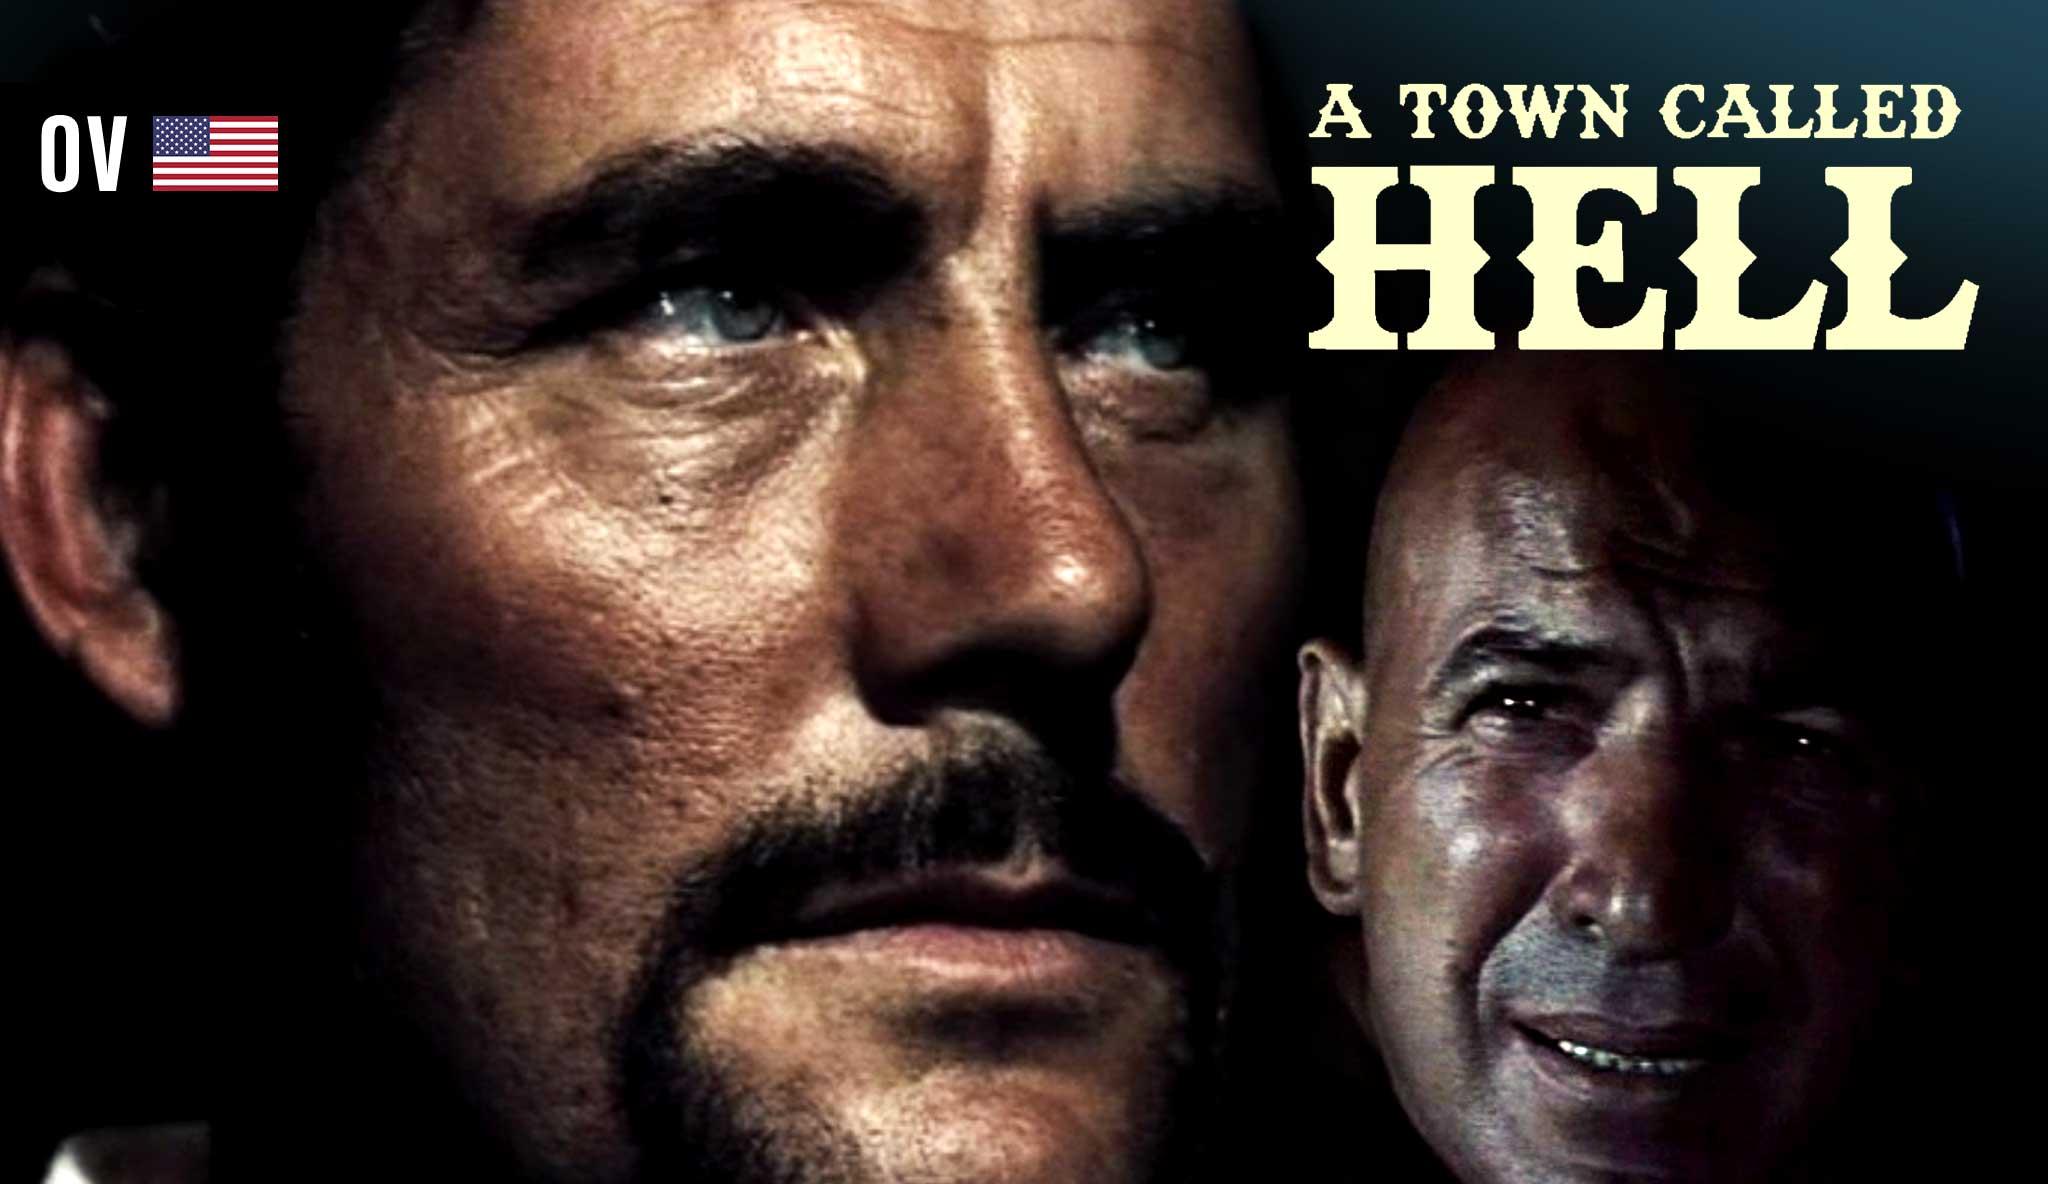 a-town-called-hell\header.jpg